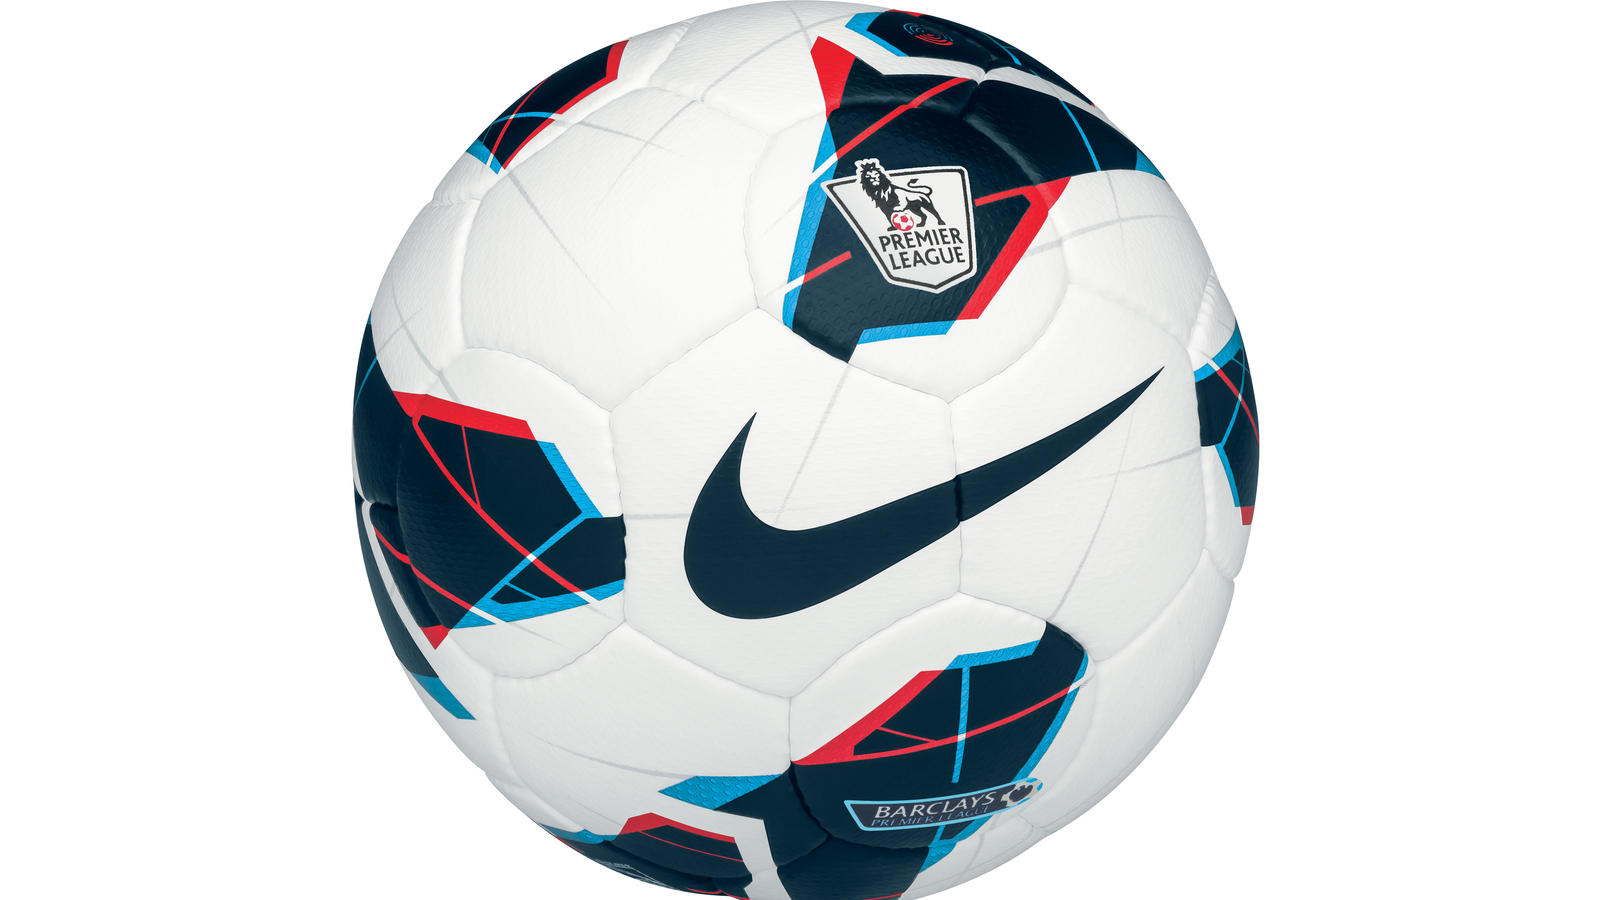 Nike Renews Premier League Partnership Through 2018-19 ... - photo#37